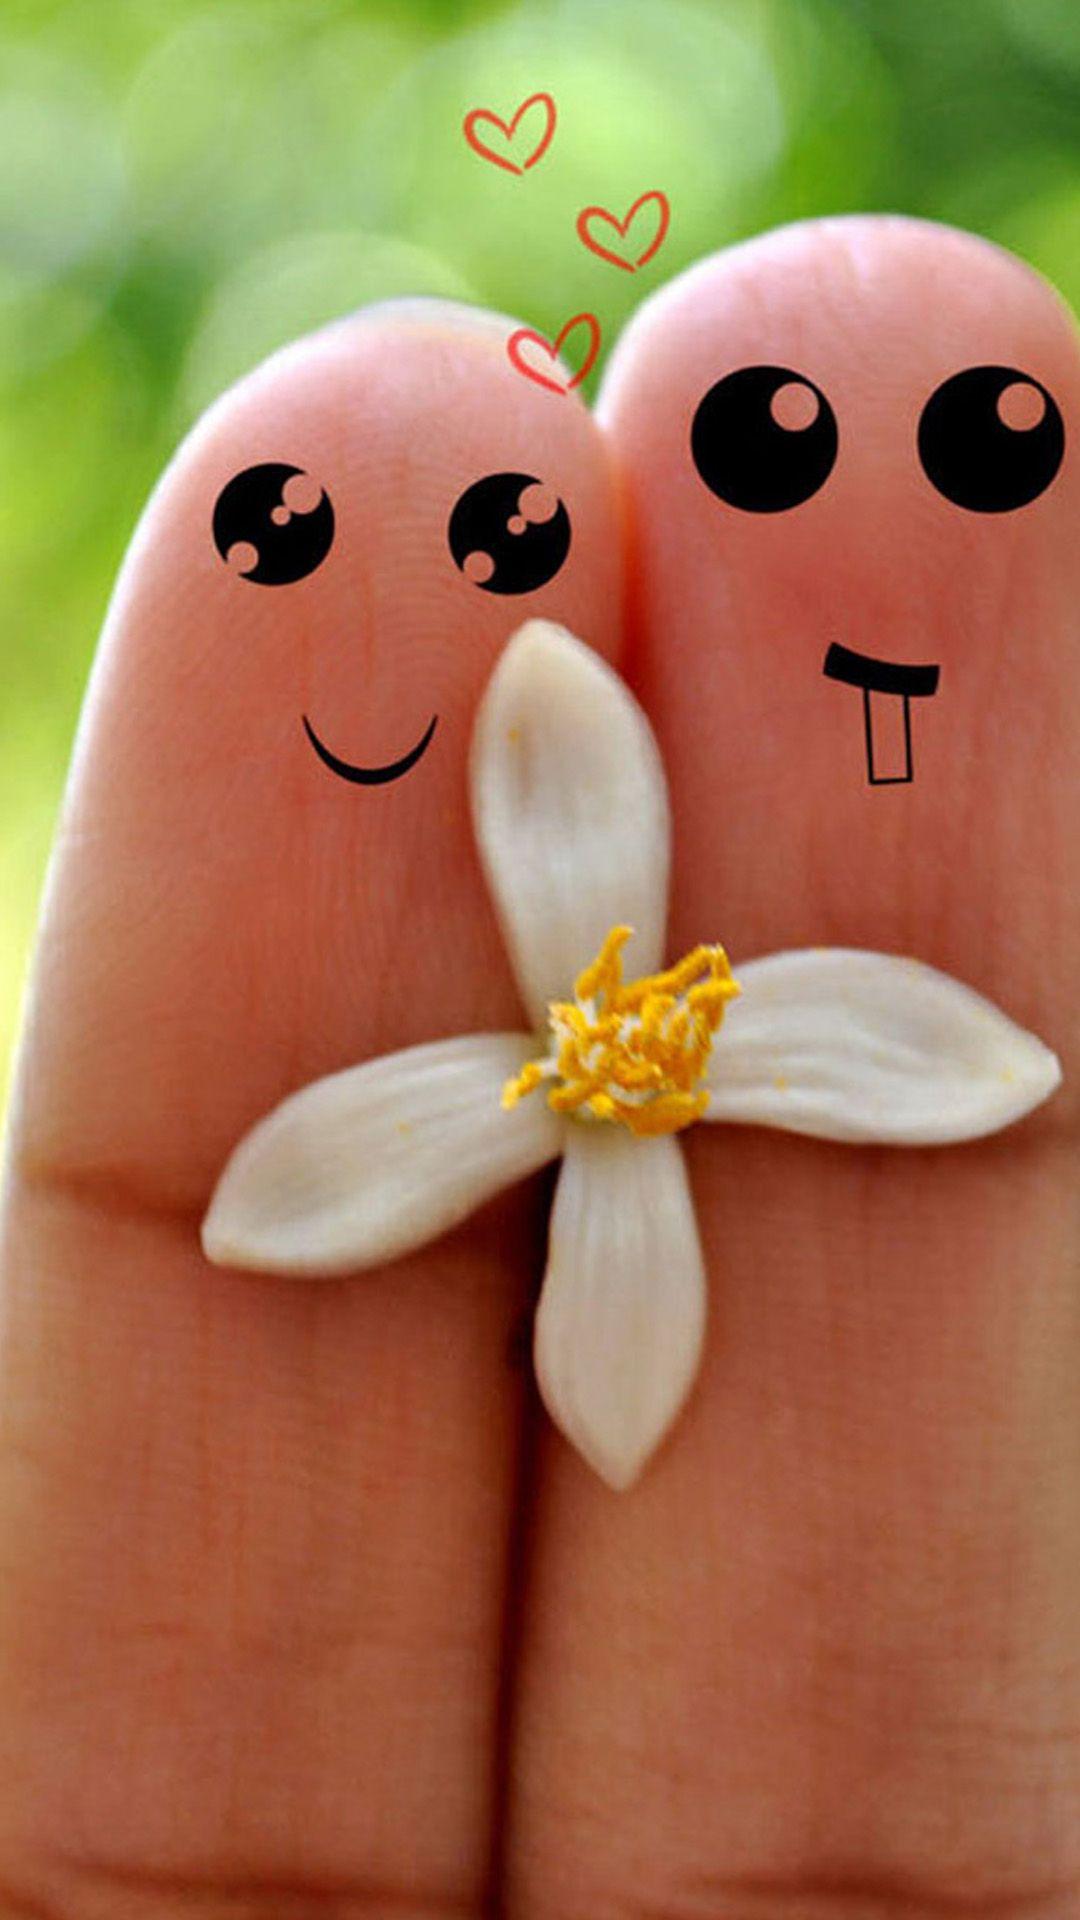 Cute Love Cartoon Couple Fingers iPhone 6 plus